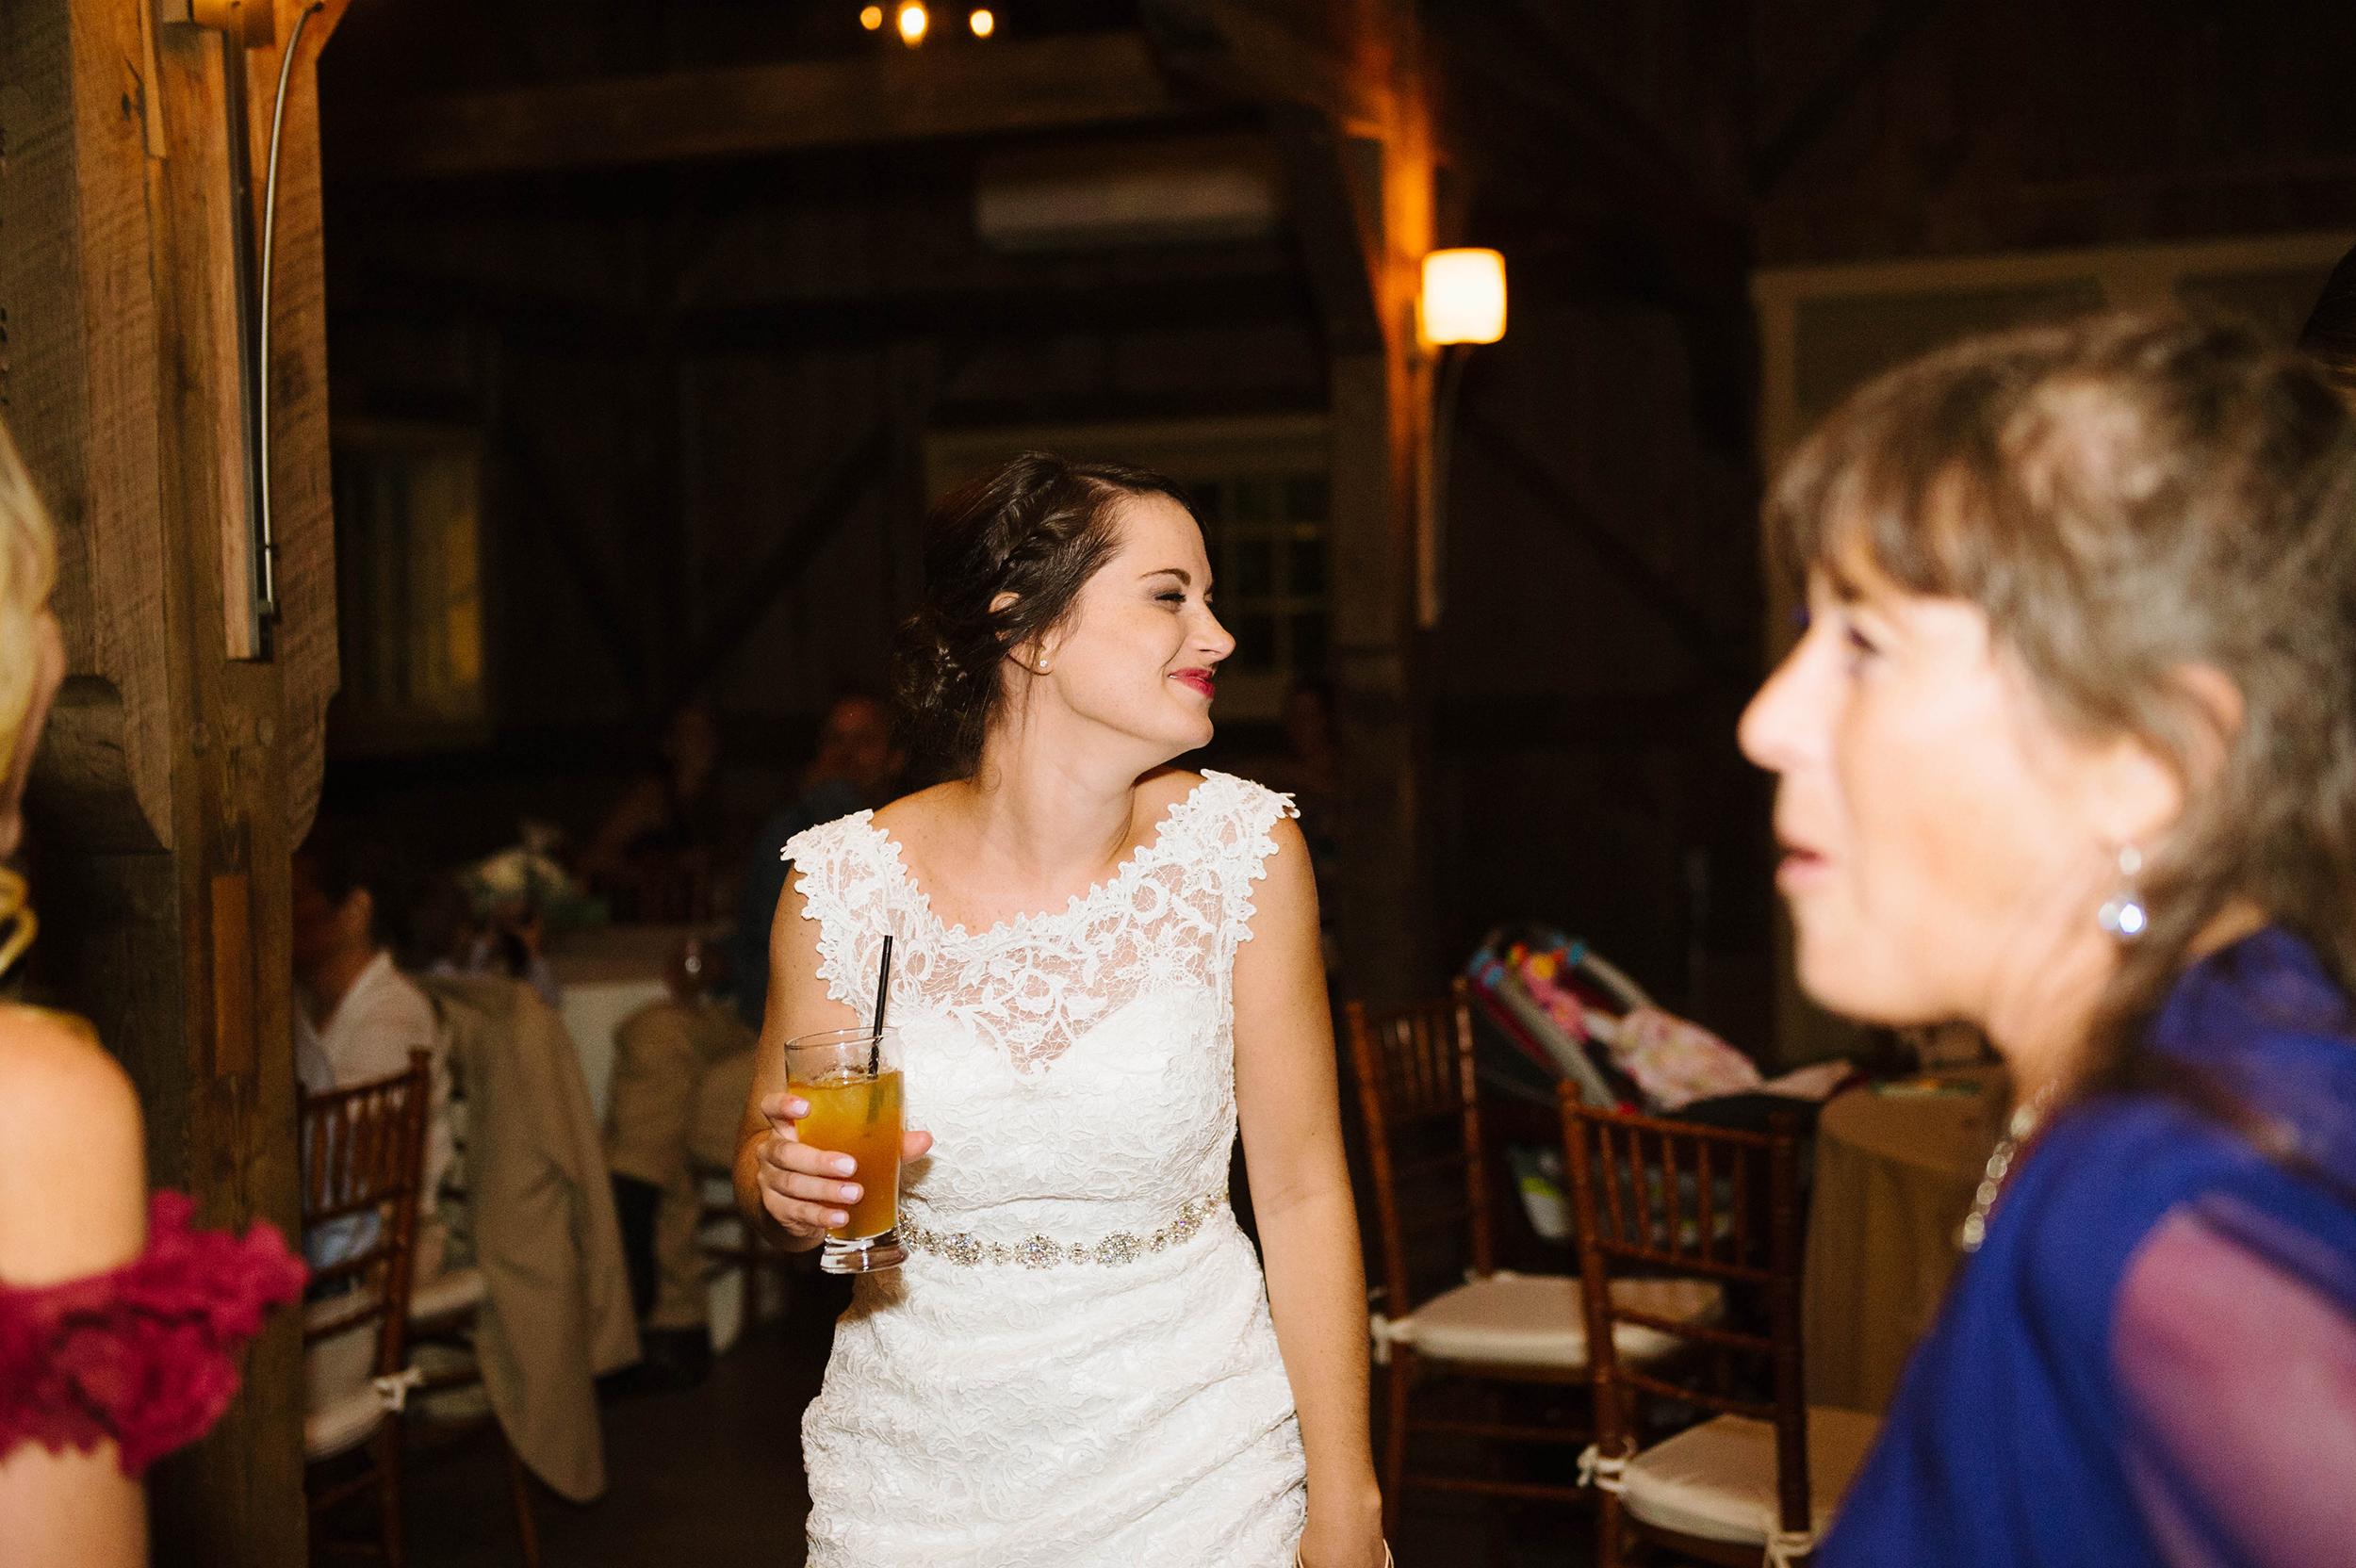 Quonquont-Farm-Wedding035.jpg